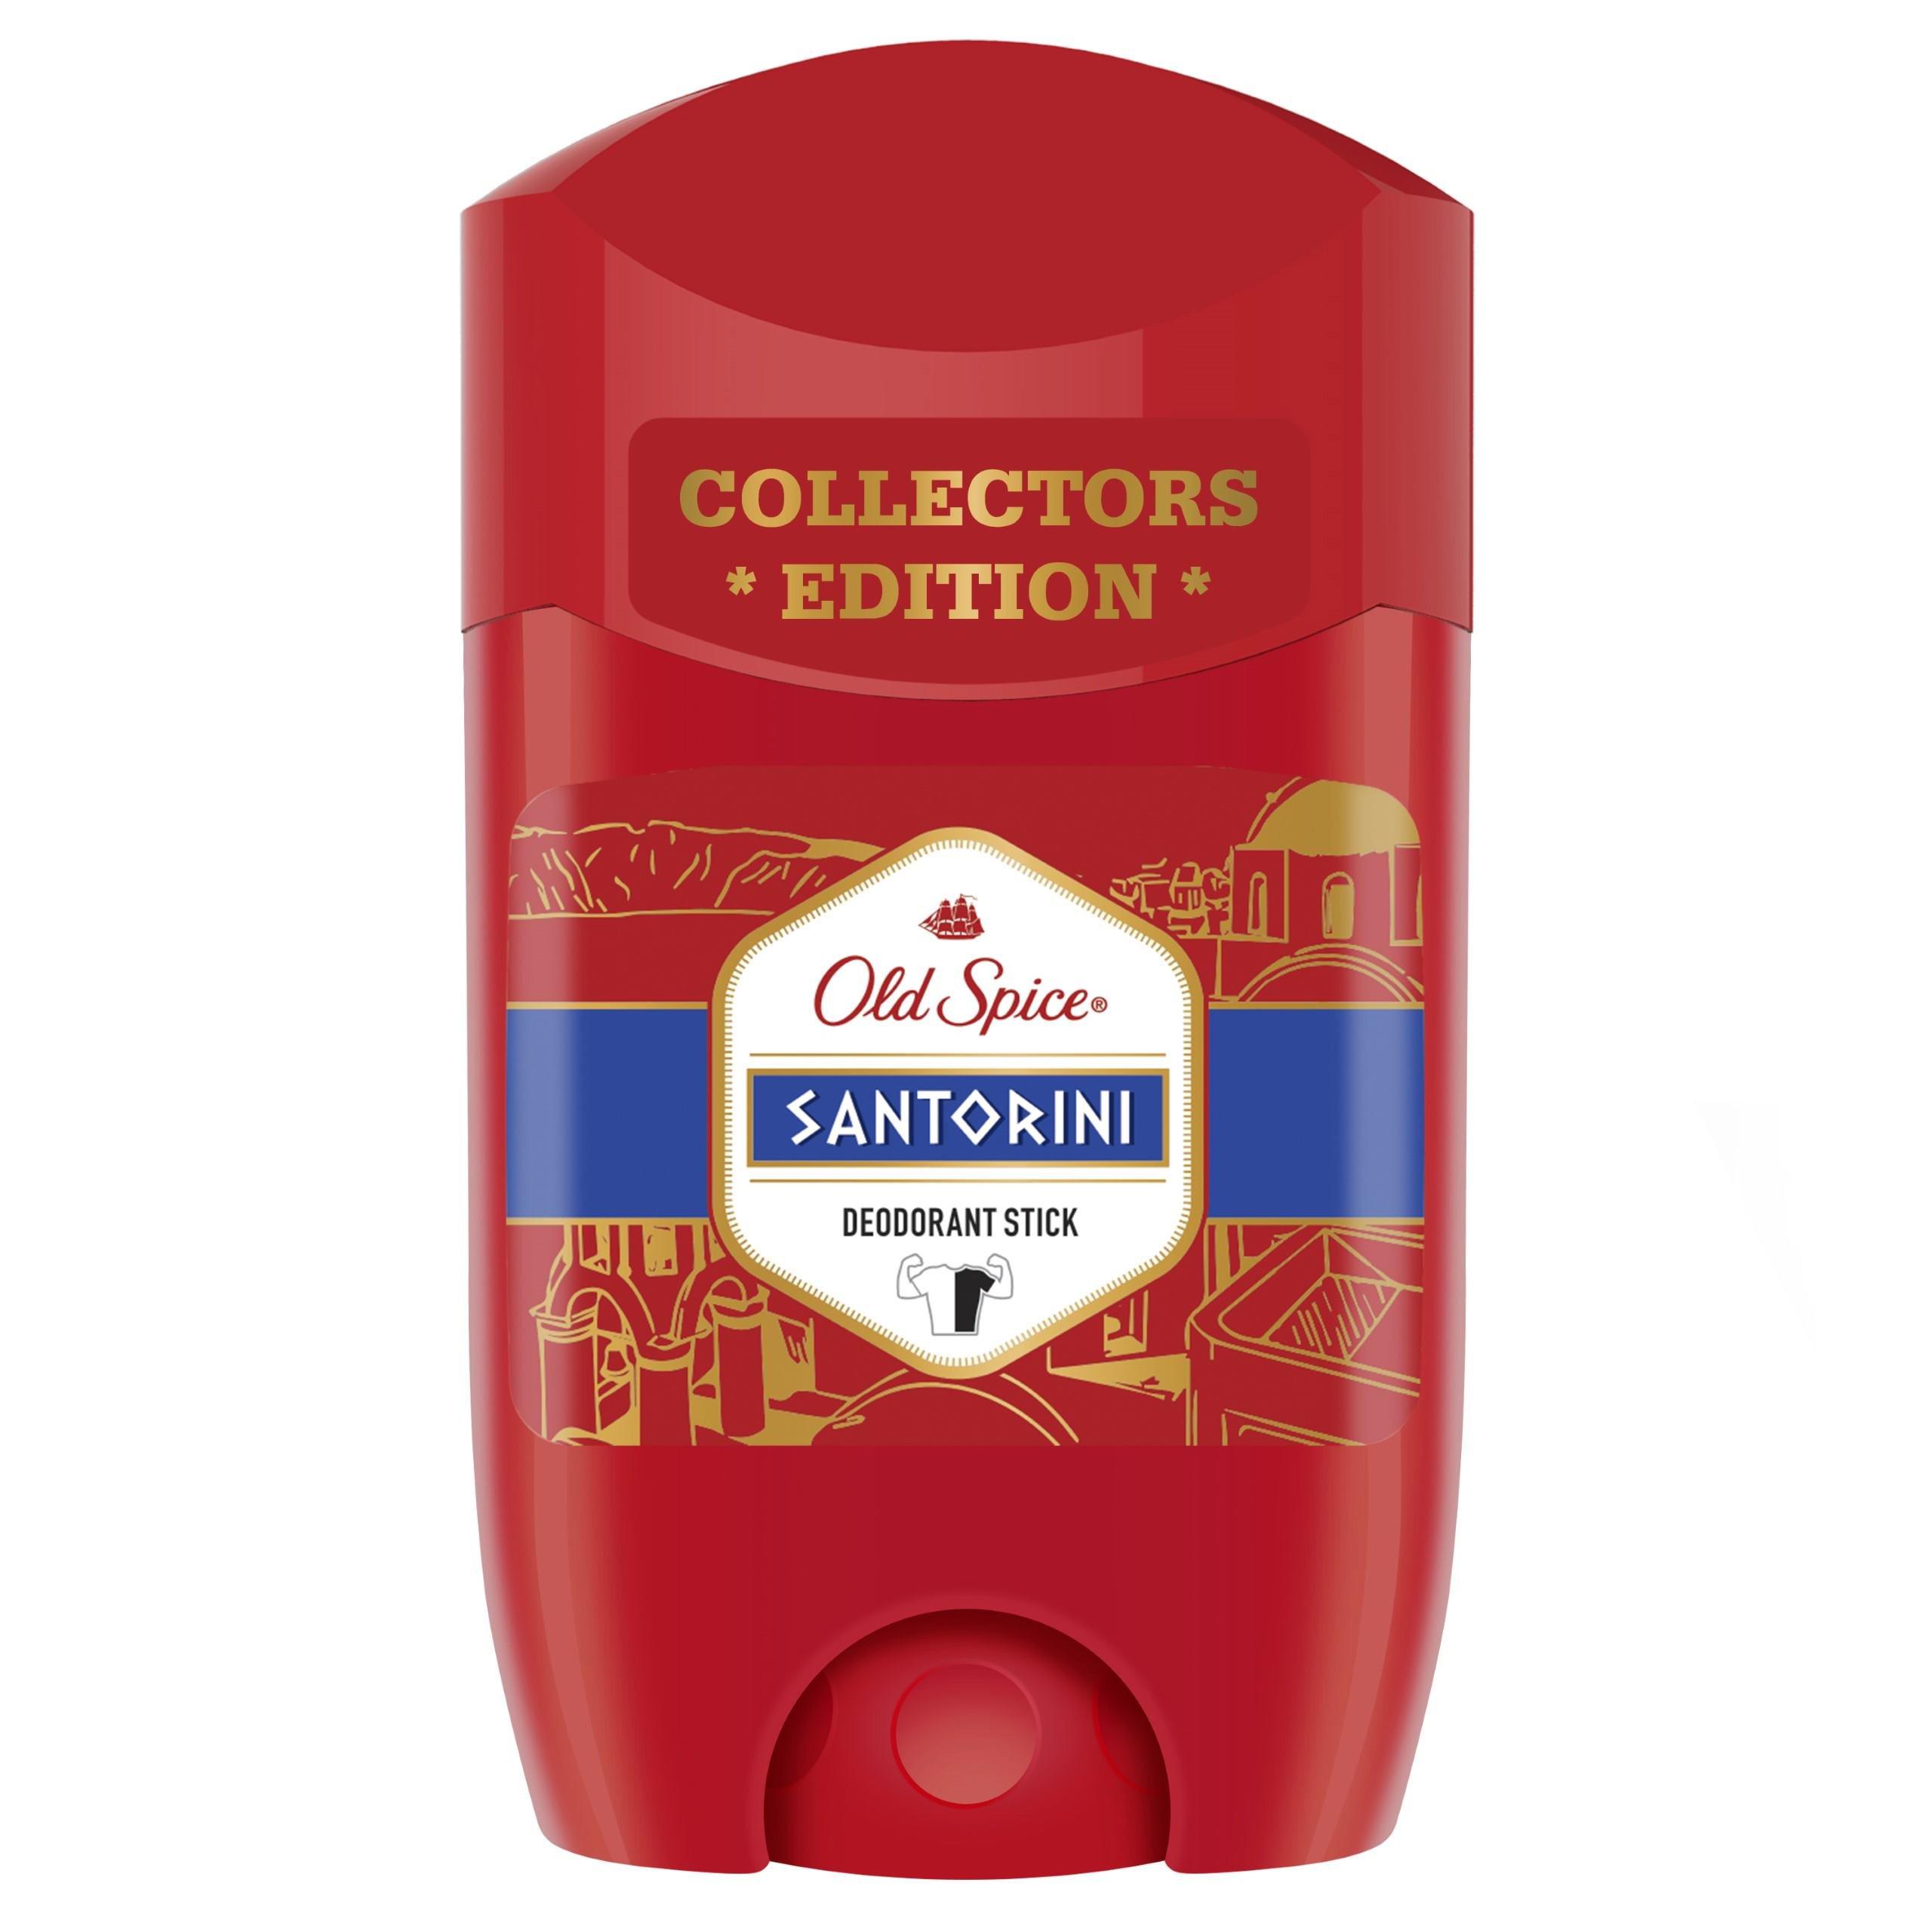 Old Spice Santorini Deodorant Stick Αποσμητικό Στίκ για Άνδρες 50ml